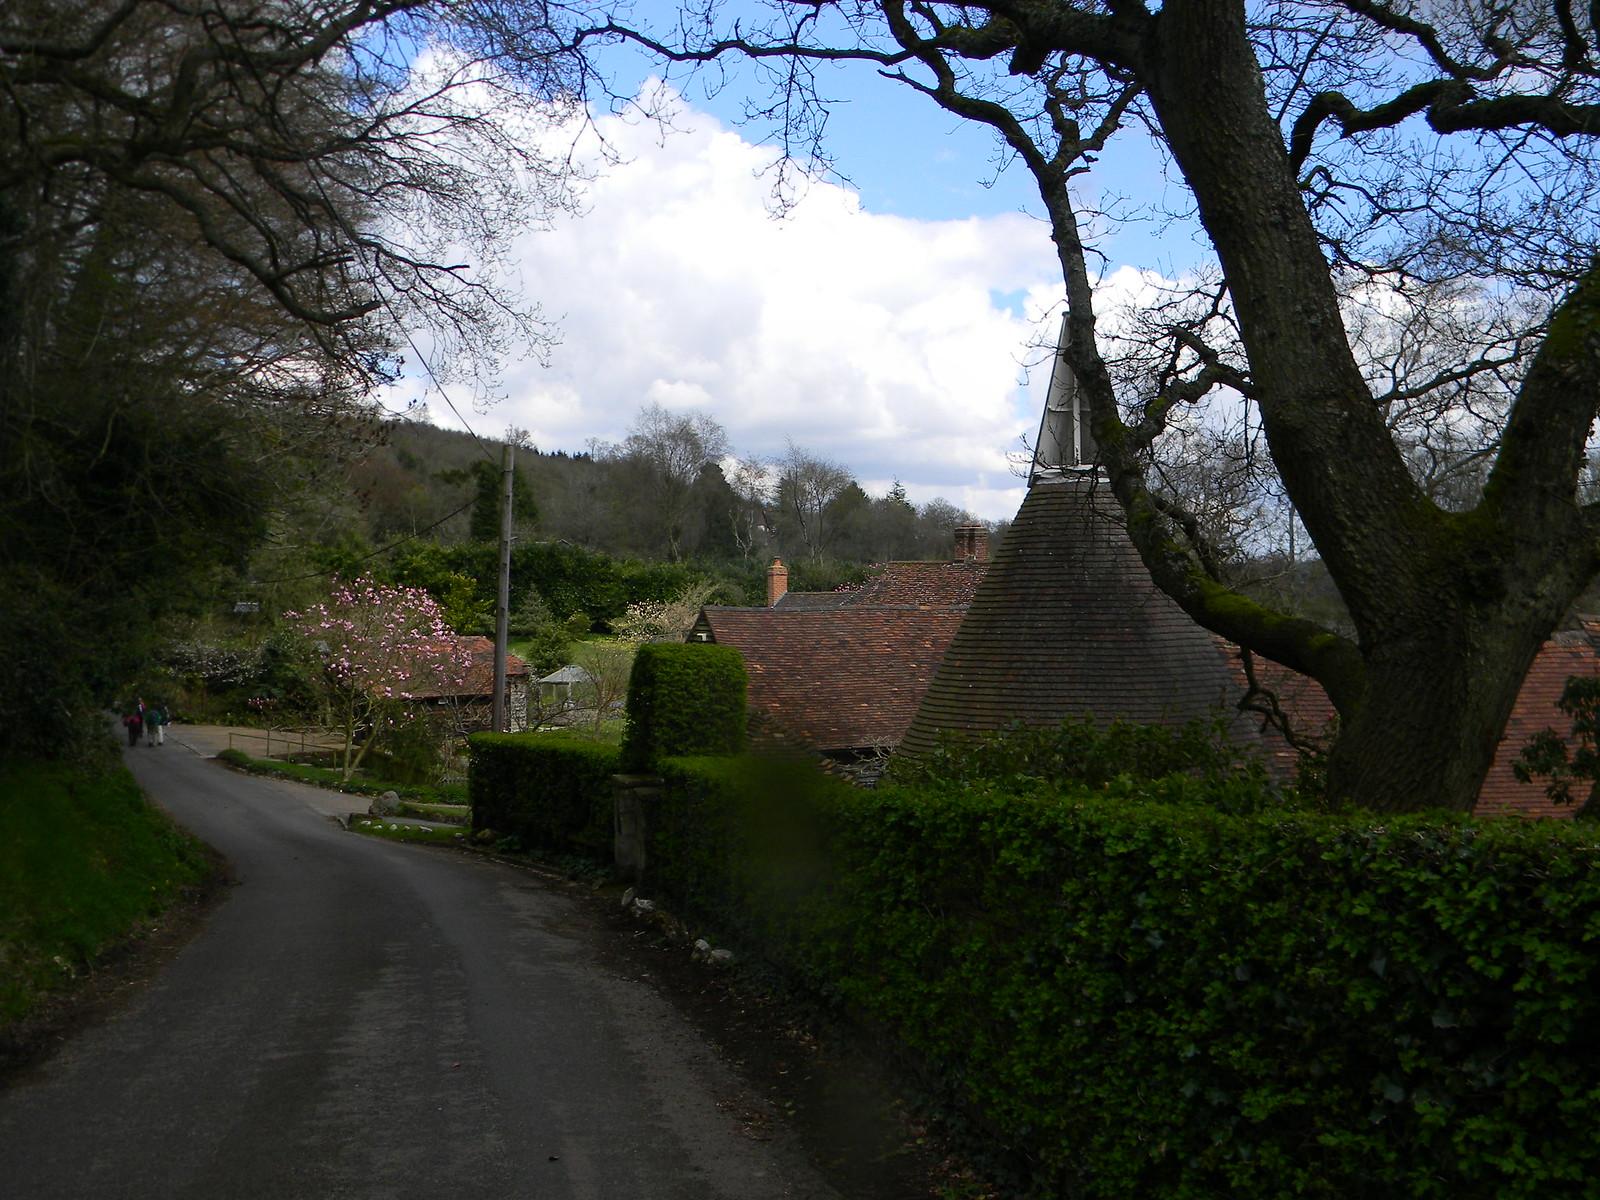 Oast Houses Chartwell Farm, I think. Hurst Green to Wetherham